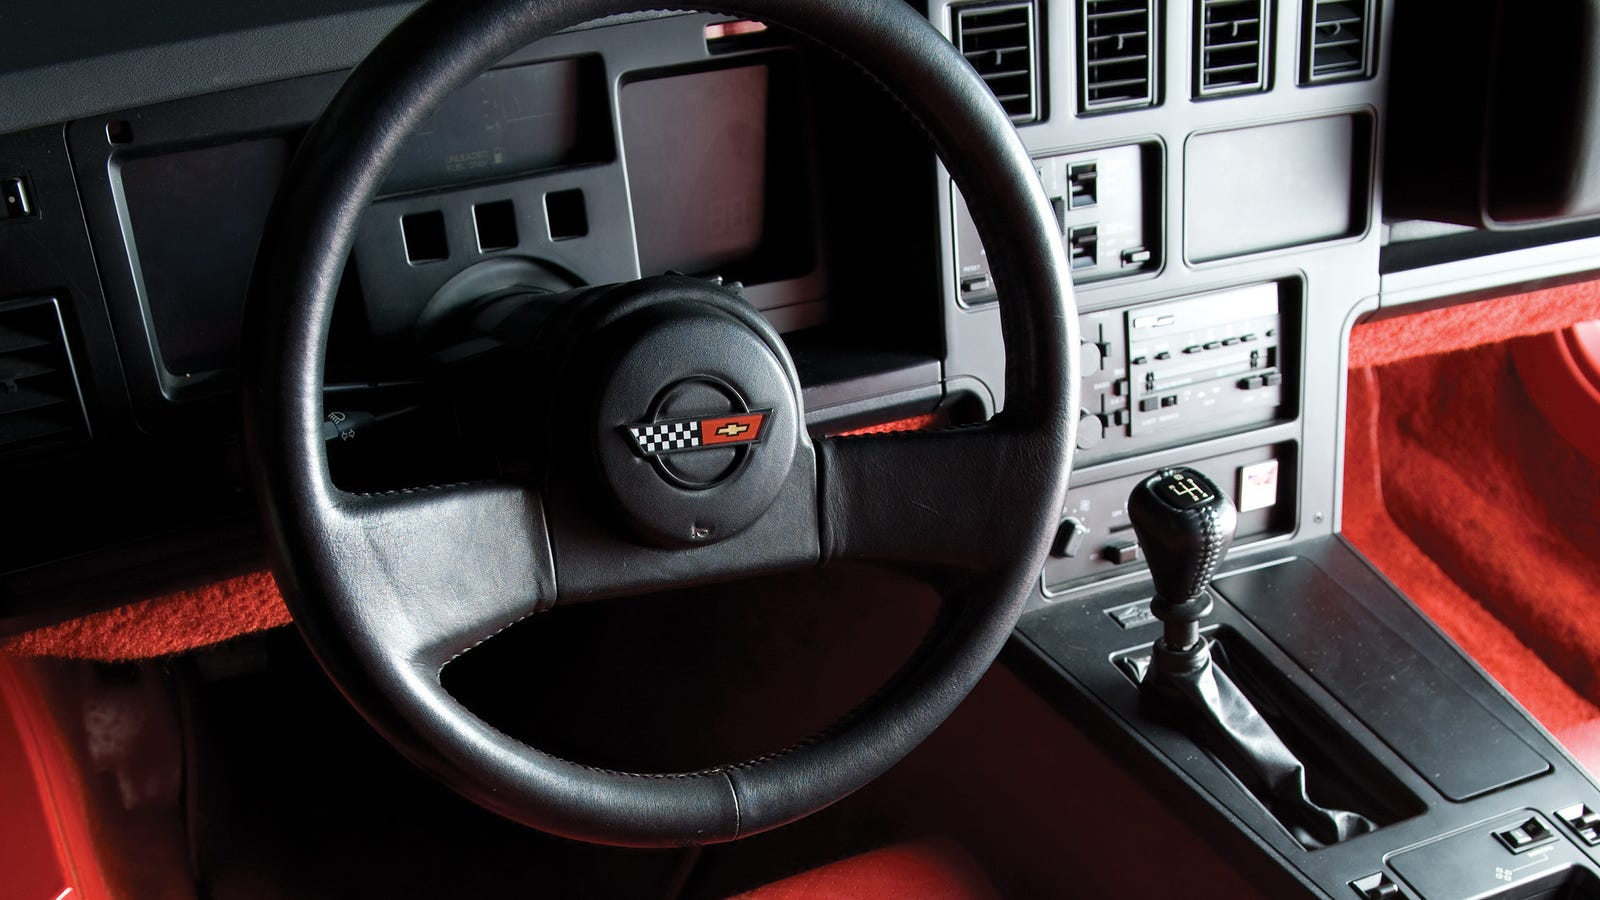 The Chevrolet Corvette C4's 'Doug Nash 4+3' Manual Transmission Is